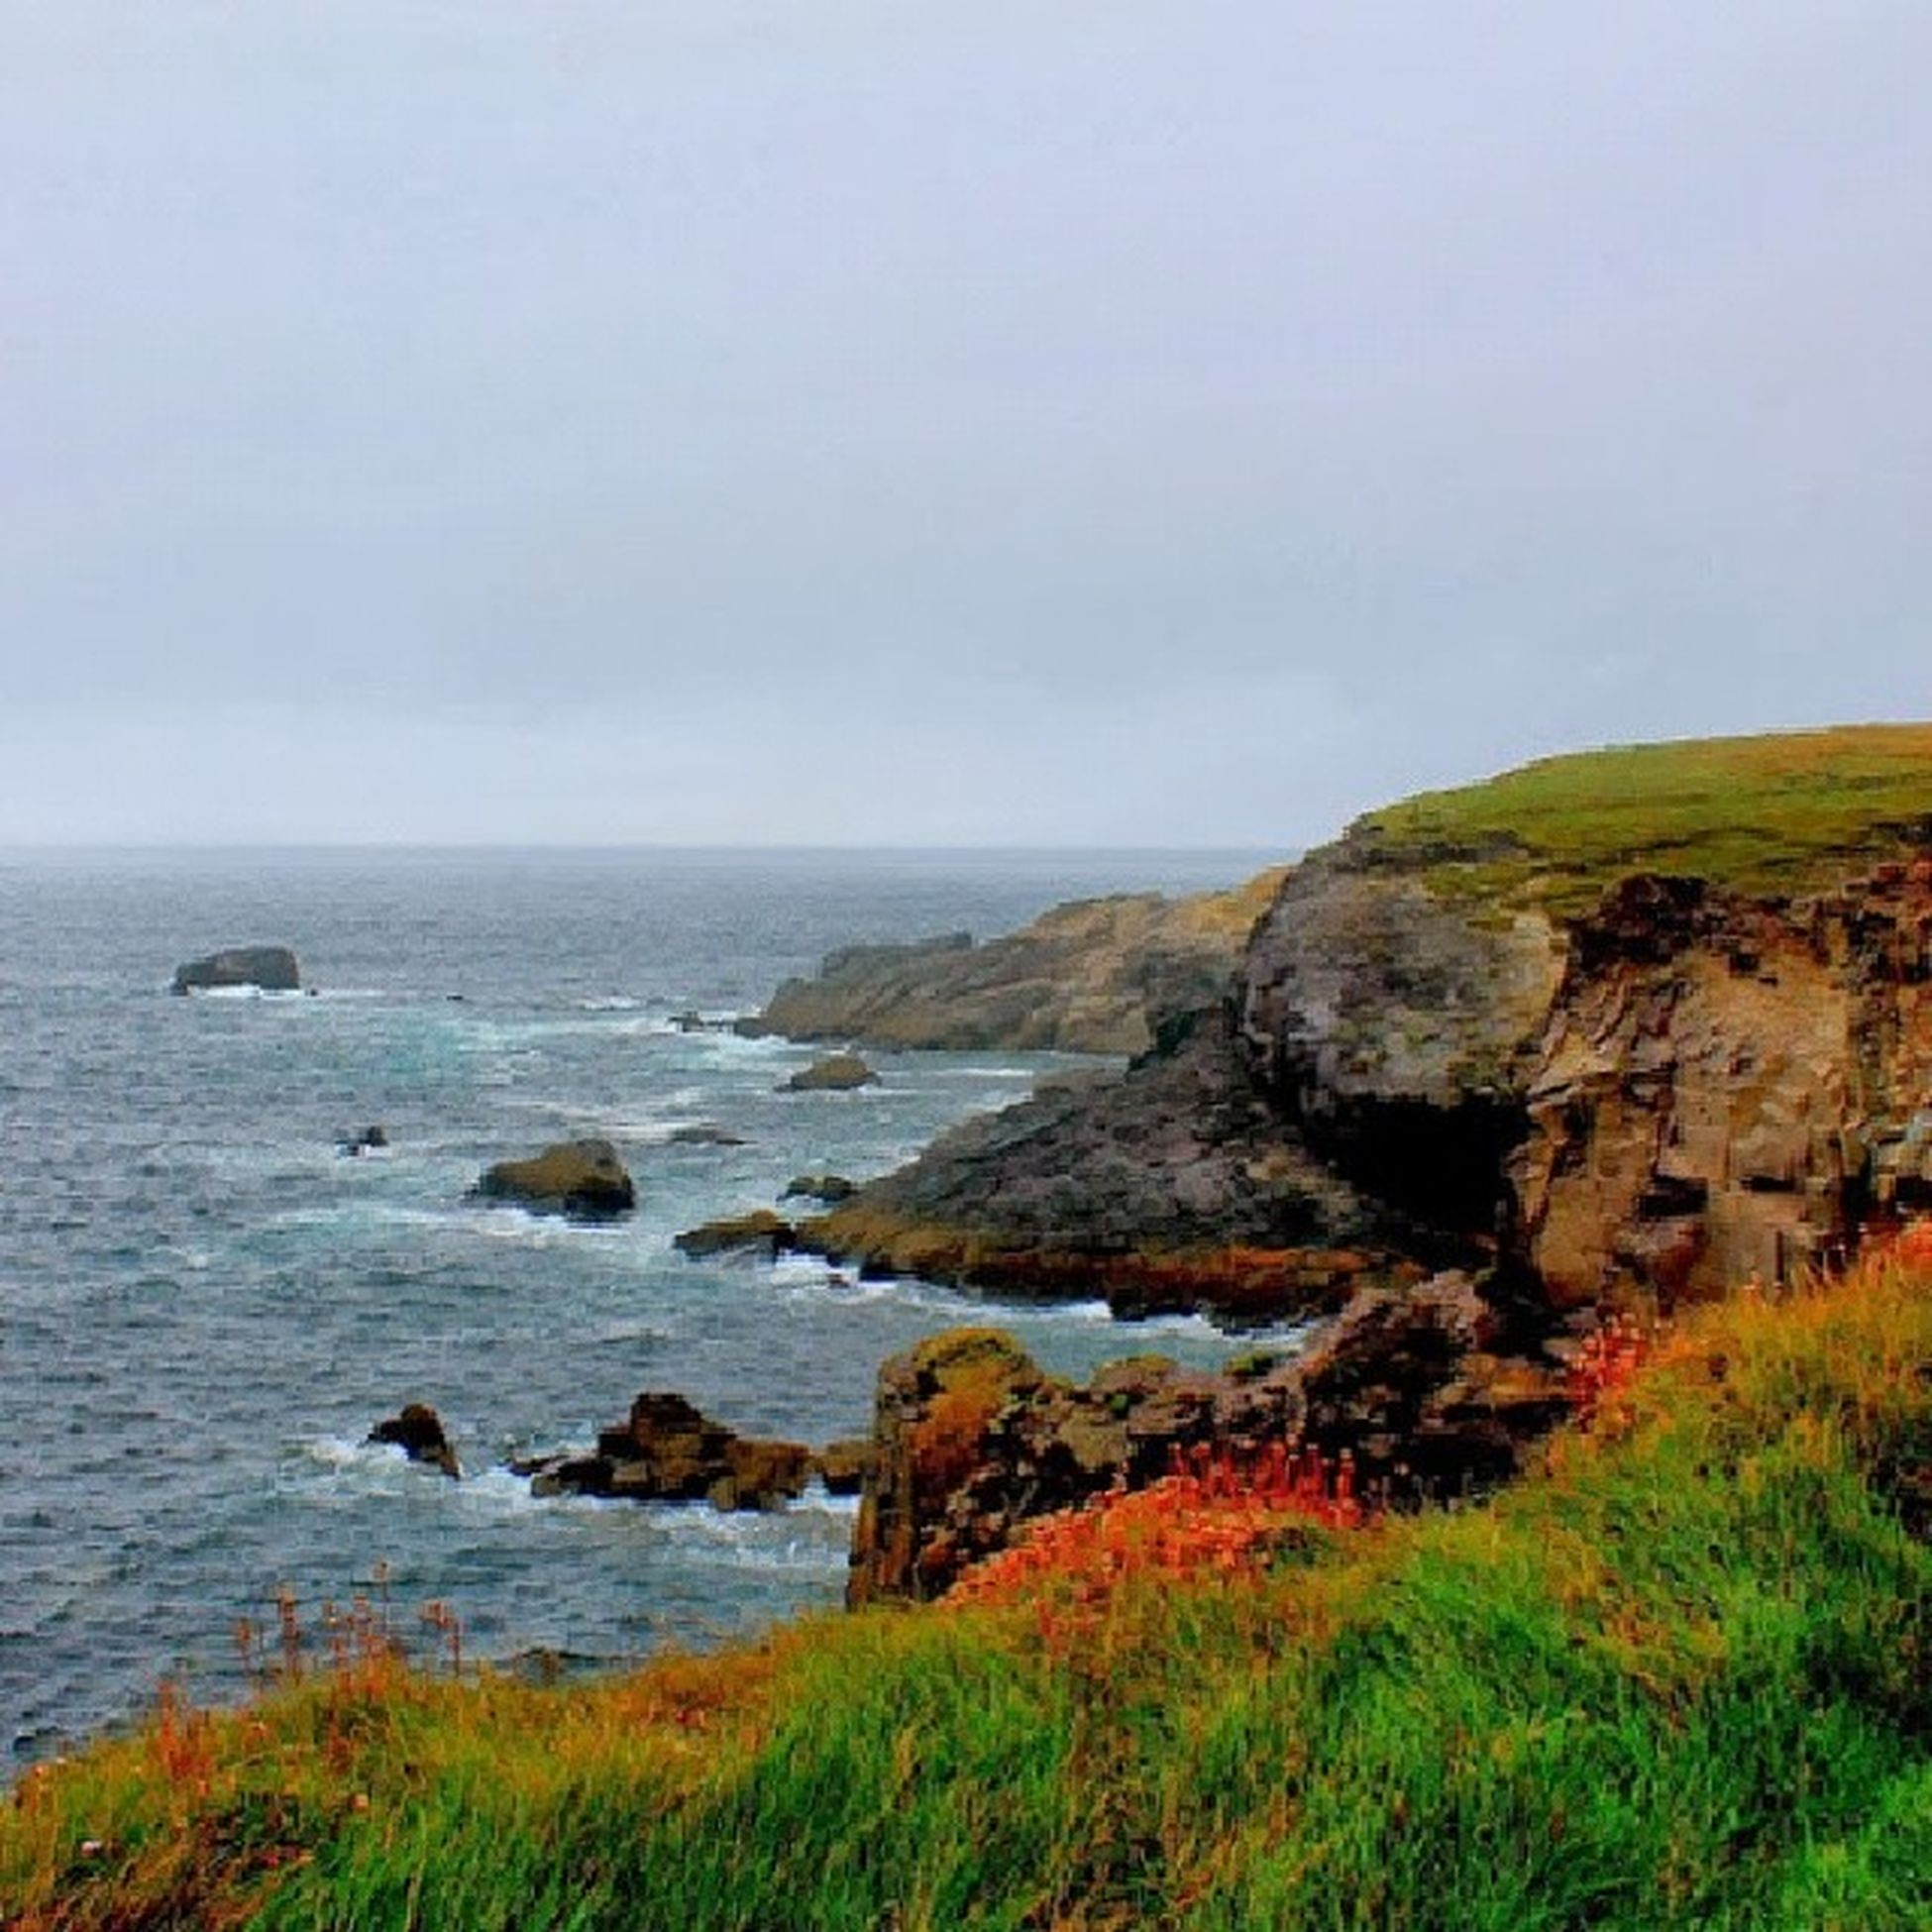 Liveontheedge Love Landskape Ireland dinglepeninsula sea cliffs